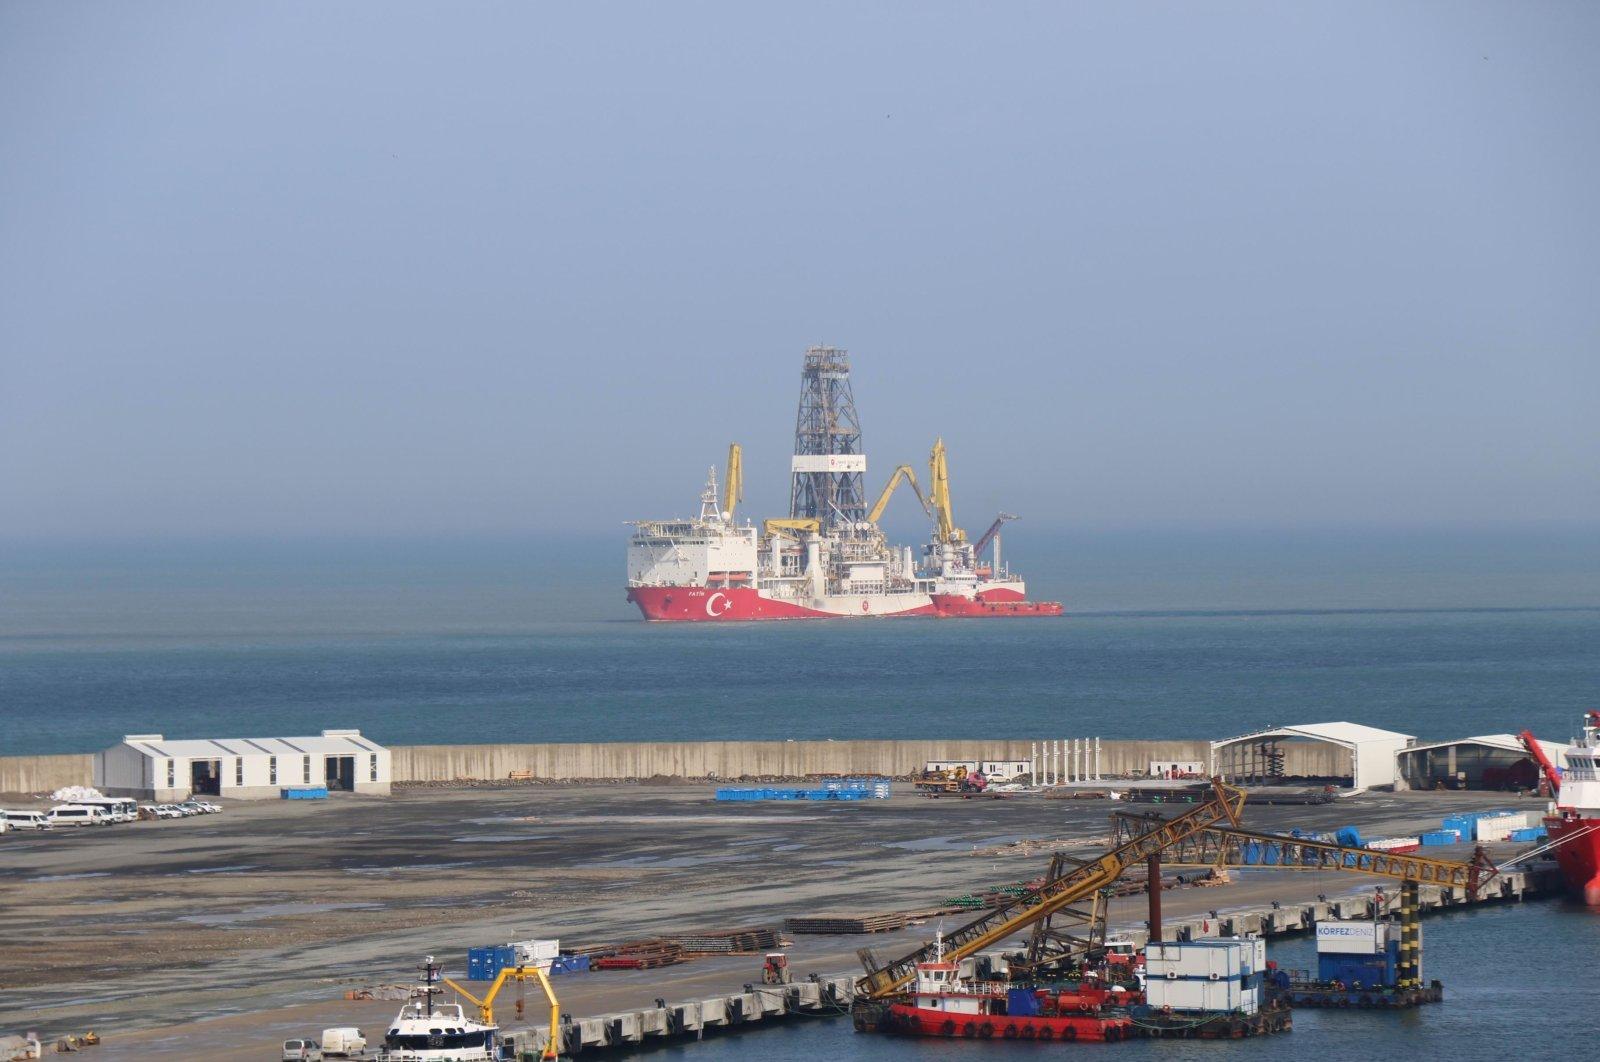 Turkey's first drillship Fatih can be seen off the Port of Filyos in Zonguldak, northern Turkey, April 6, 2021. (IHA Photo)